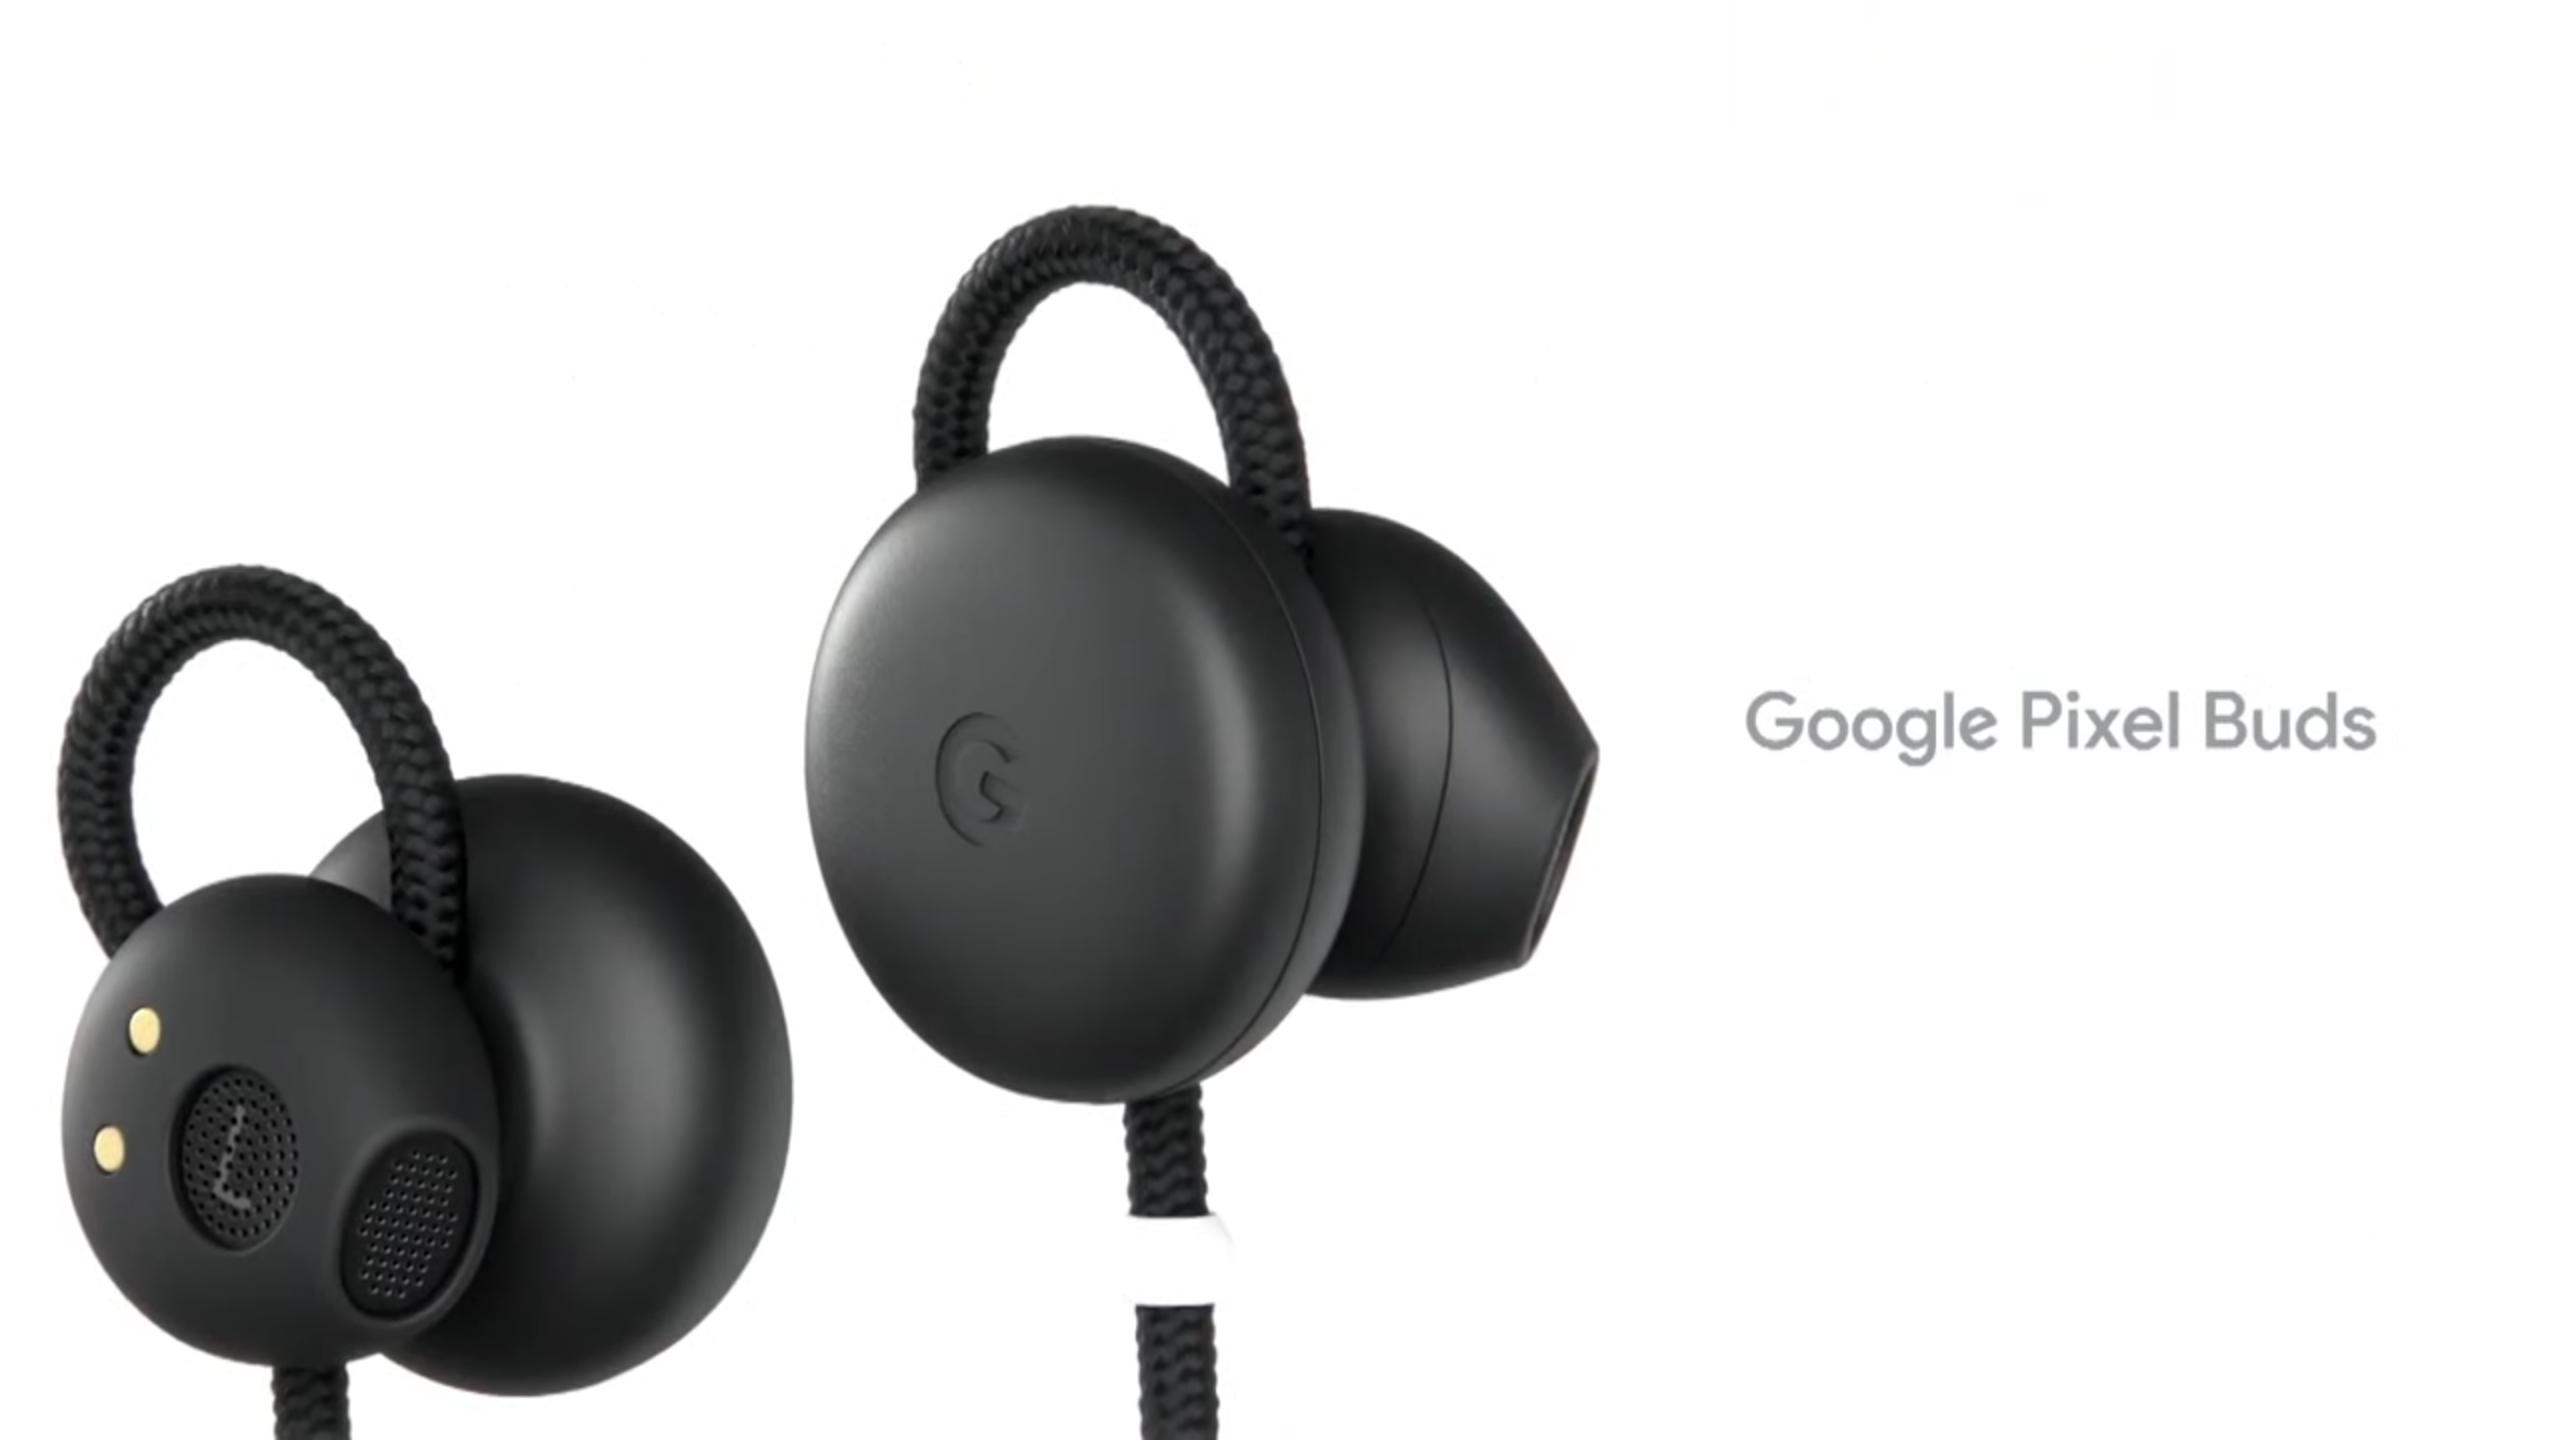 c700b0eb67a Google's $159 Pixel Buds offer real-time translation, other smarts